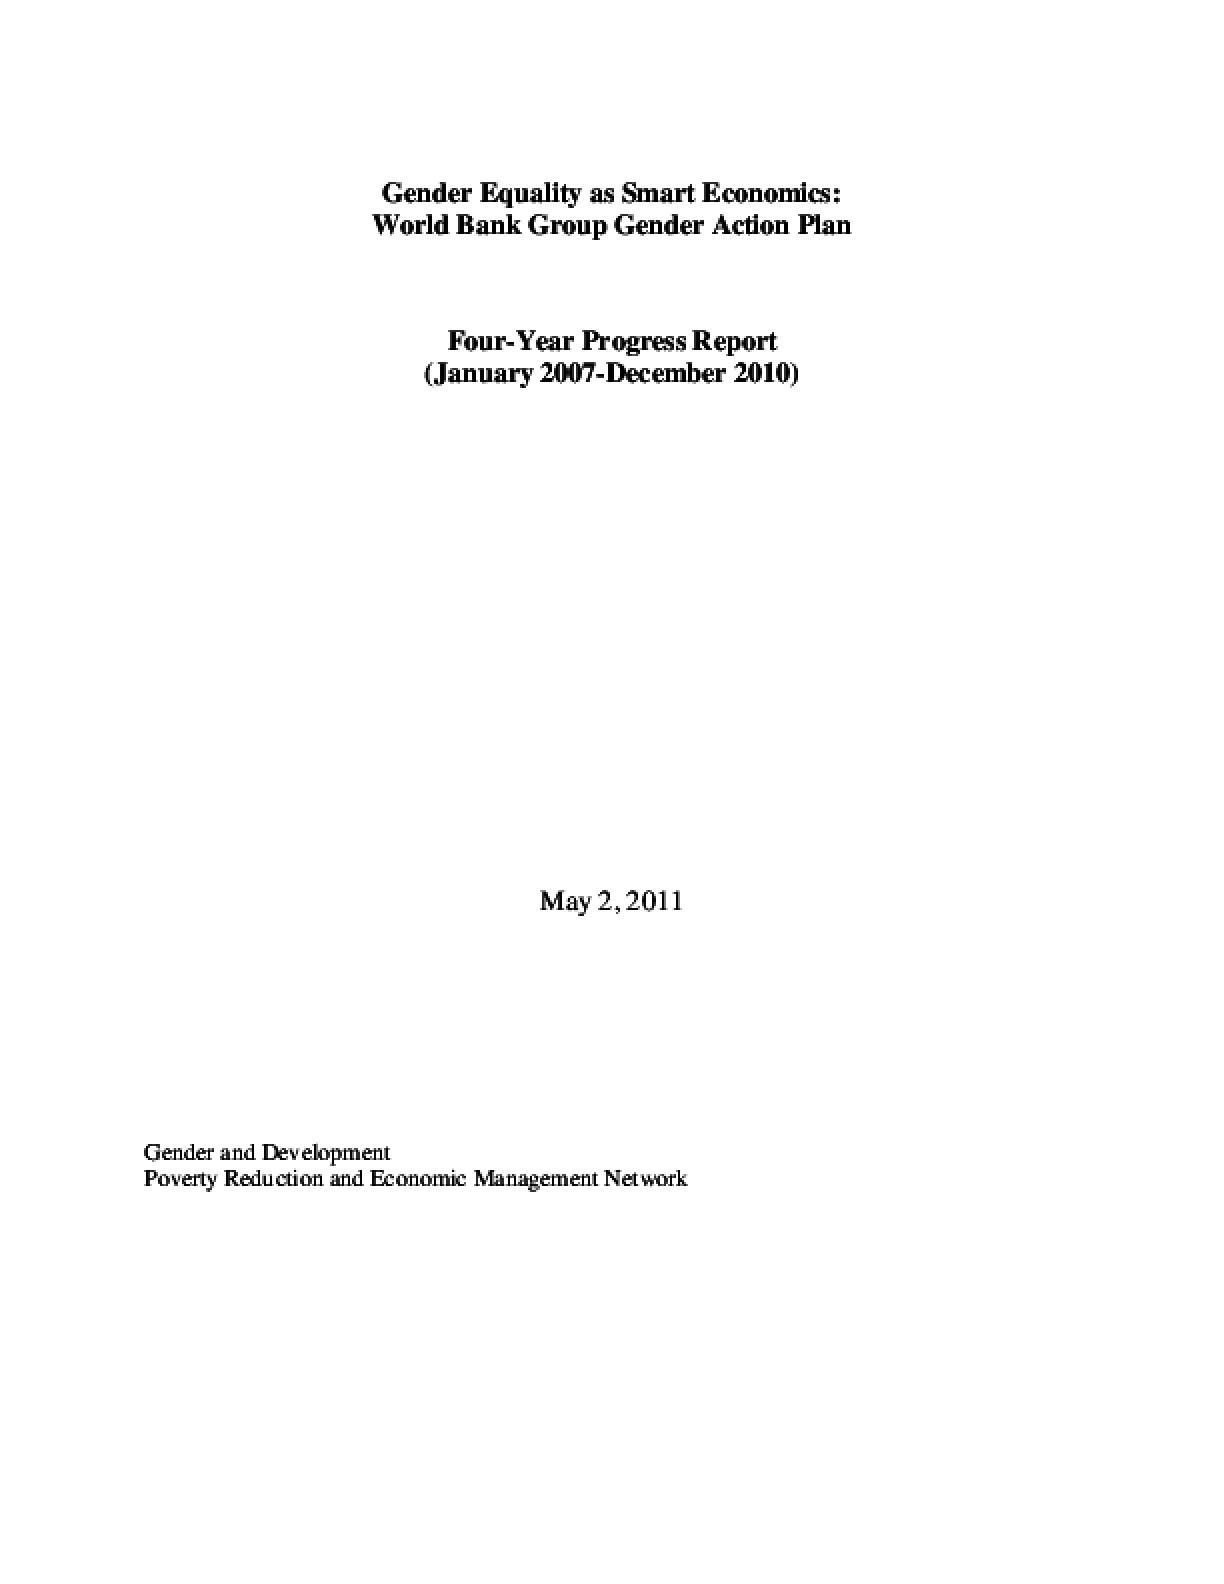 Gender Equality as Smart Economics: World Bank Group Gender Action Plan Four-Year Progress Report (January 2007-December 2010)